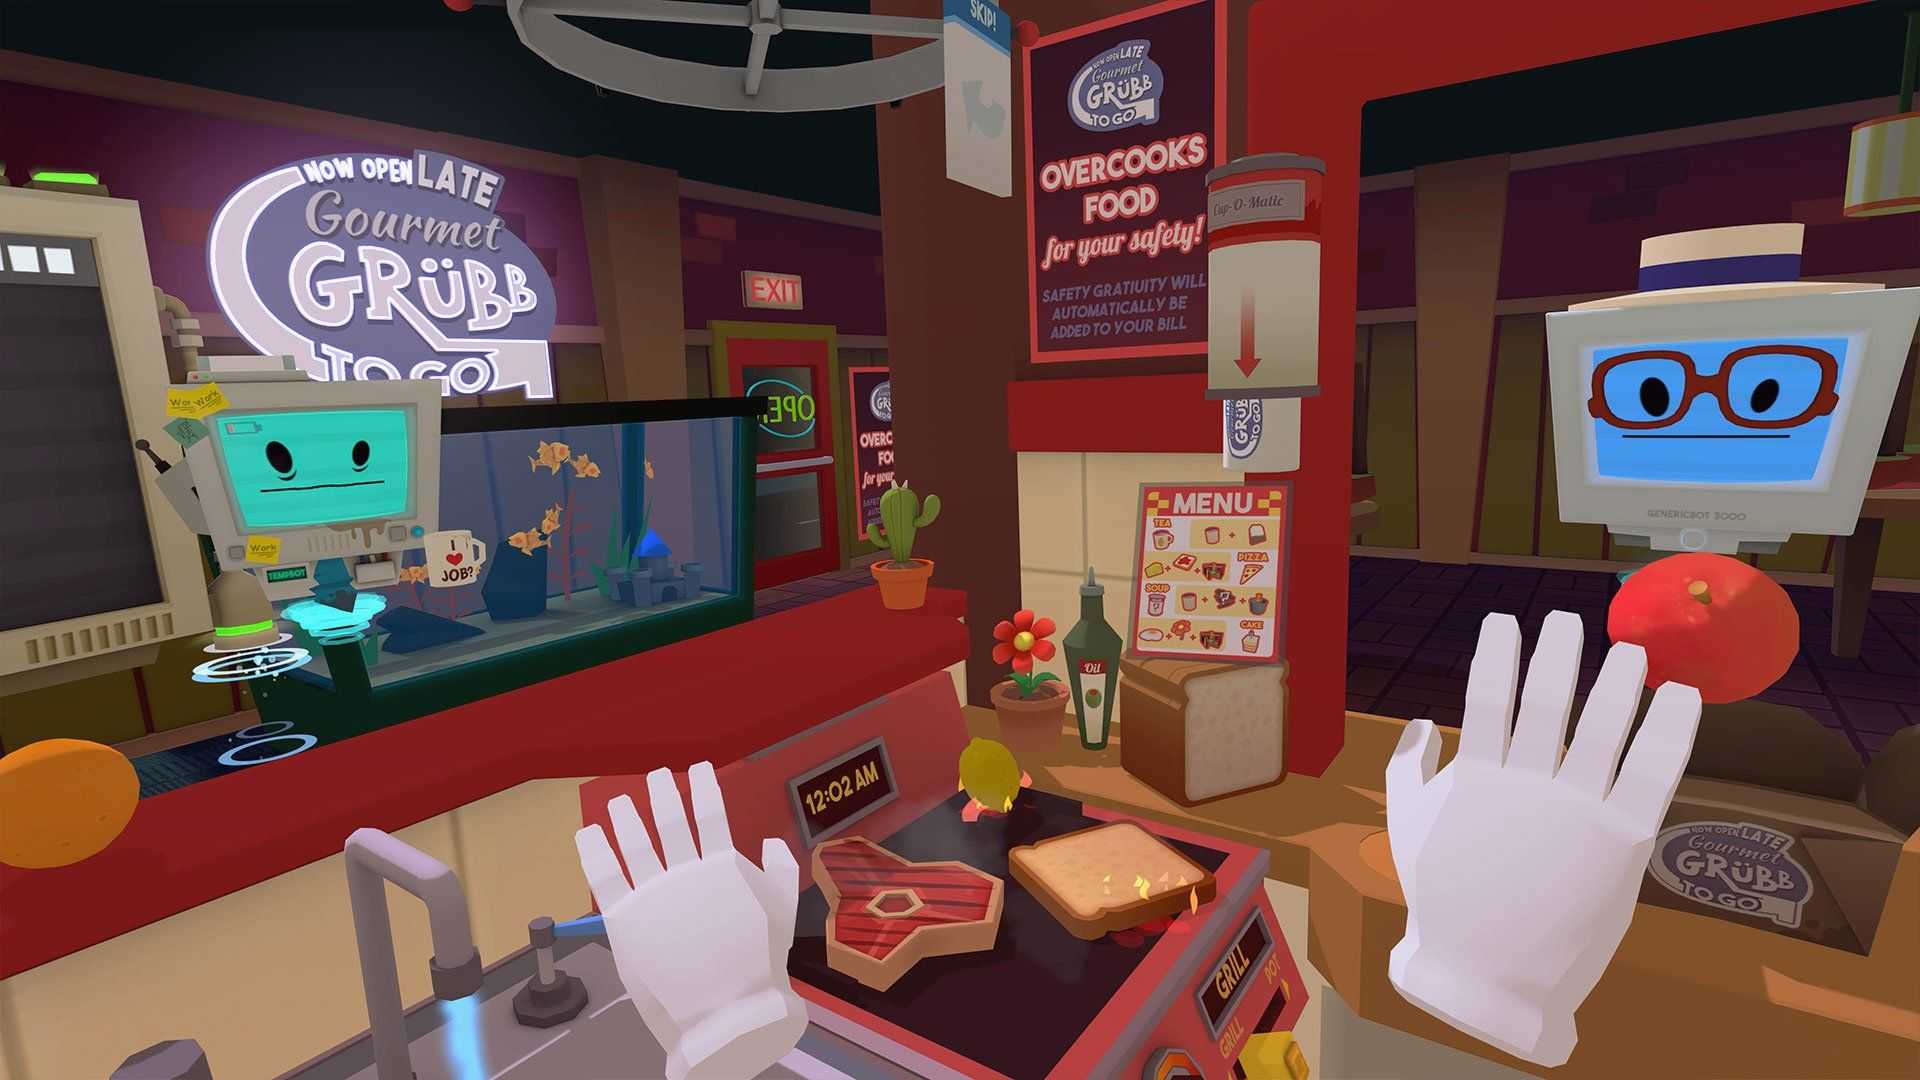 Job Simulator scores a free endless mode Virtual reality